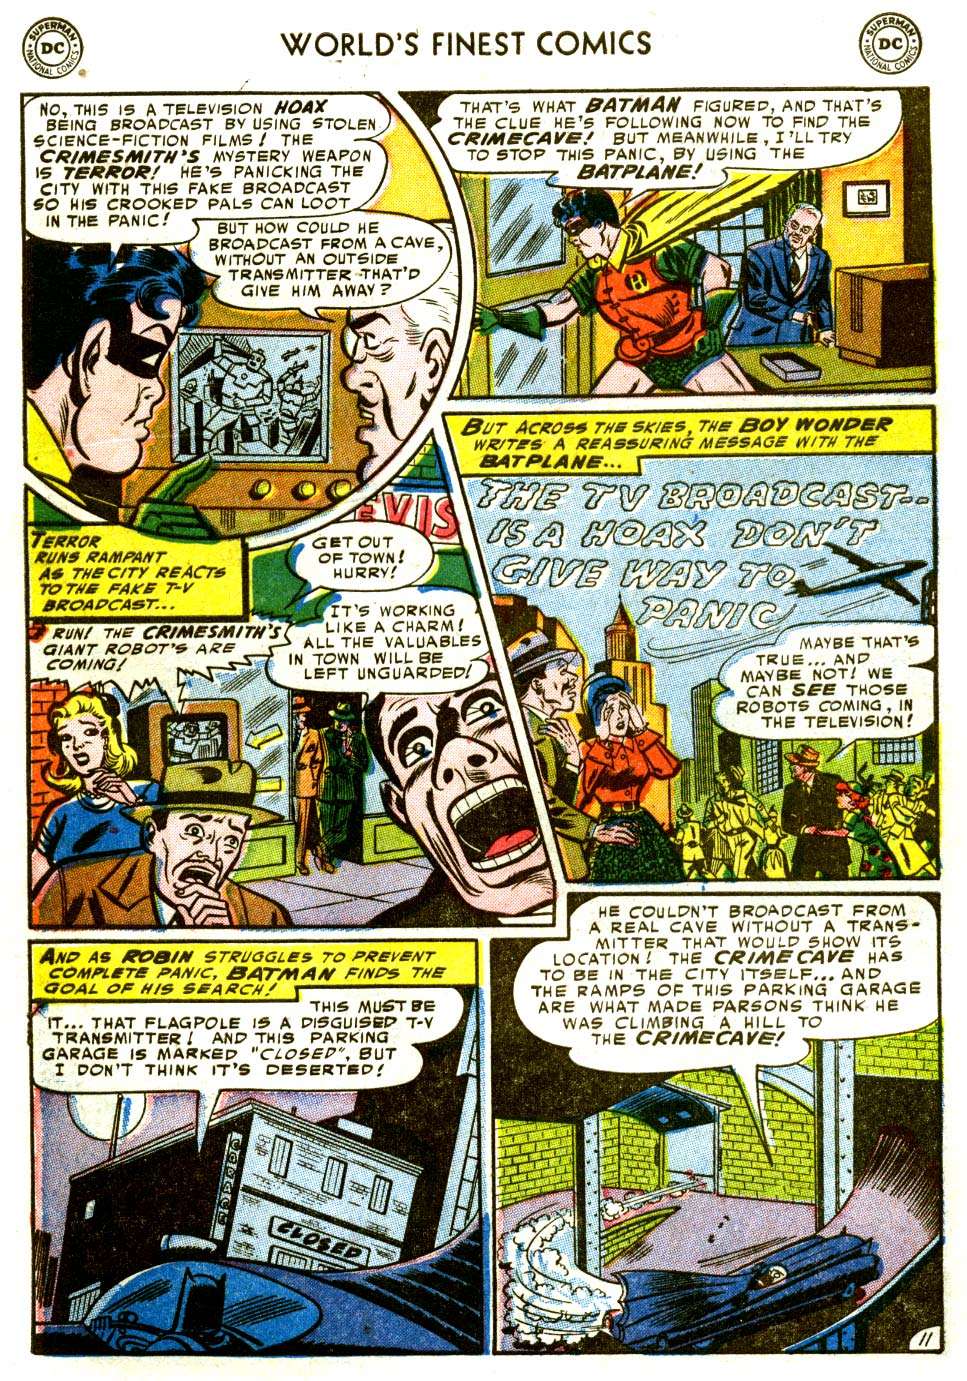 Read online World's Finest Comics comic -  Issue #68 - 64